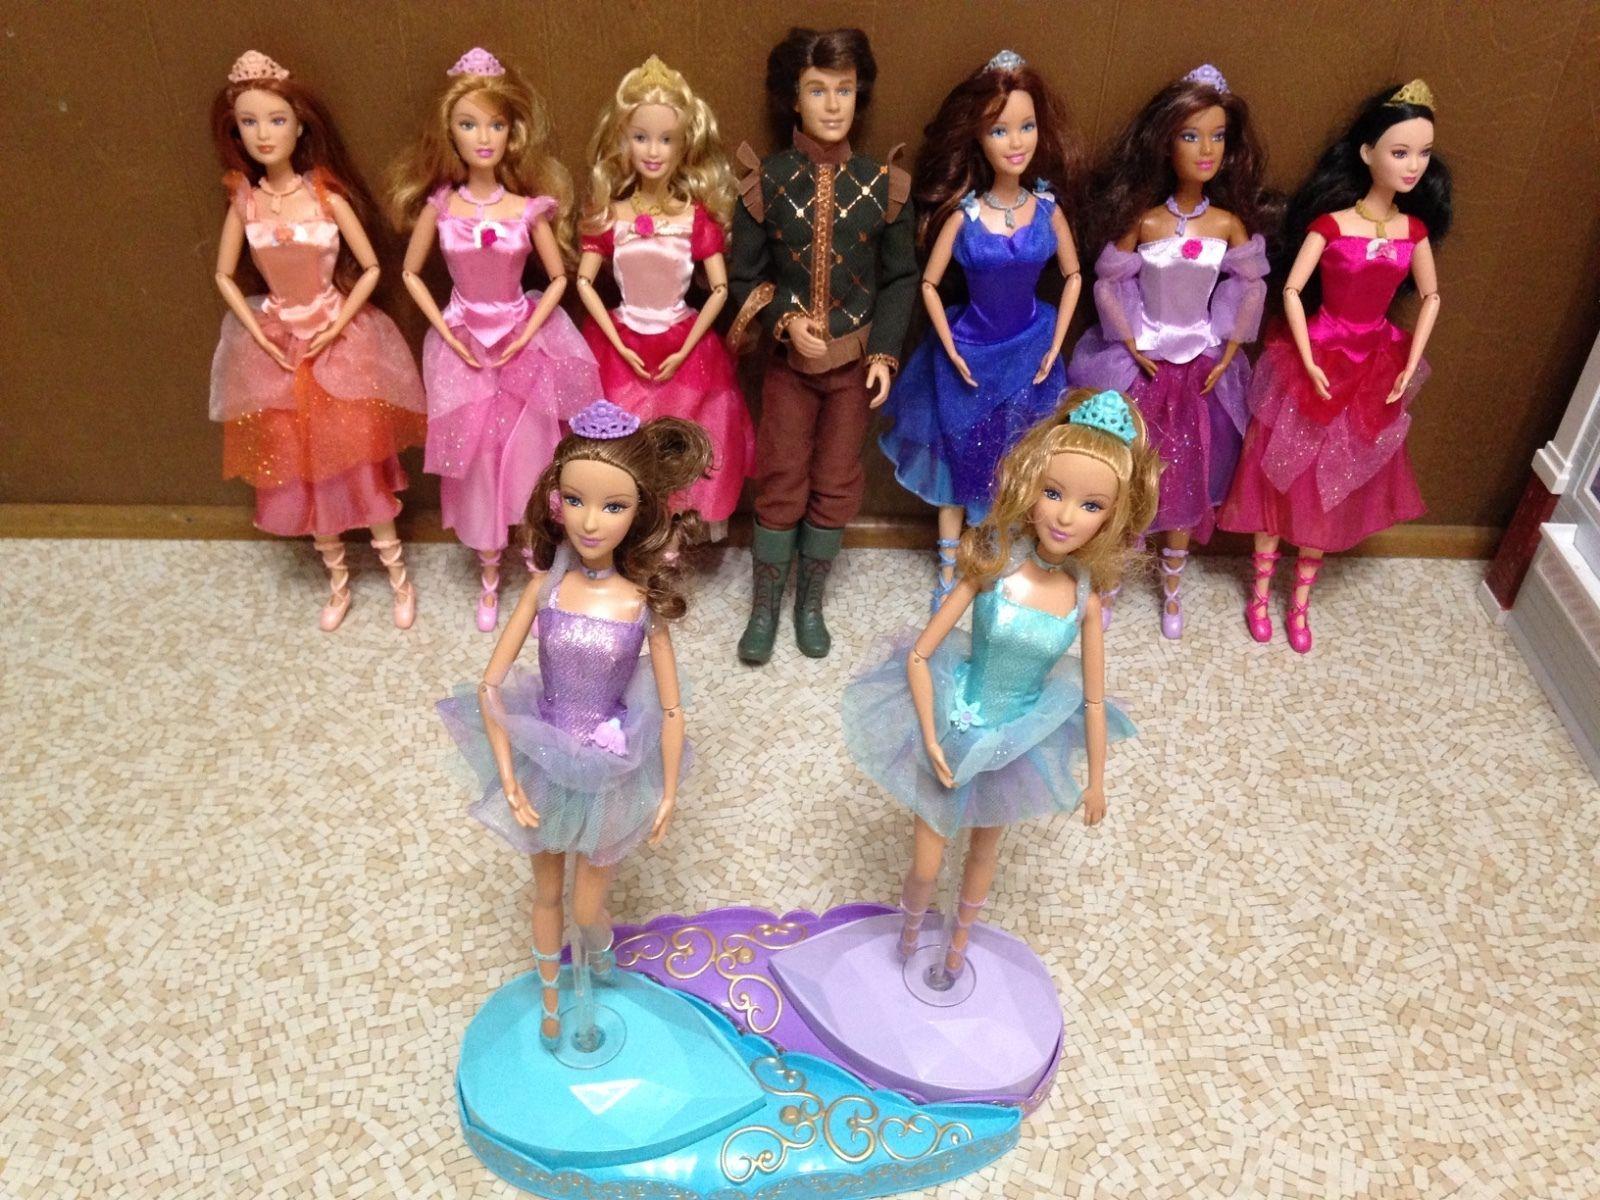 Barbie In The 12 Dancing Princess Ashlyn Courtney Edeline Fallon Blair Genevieve